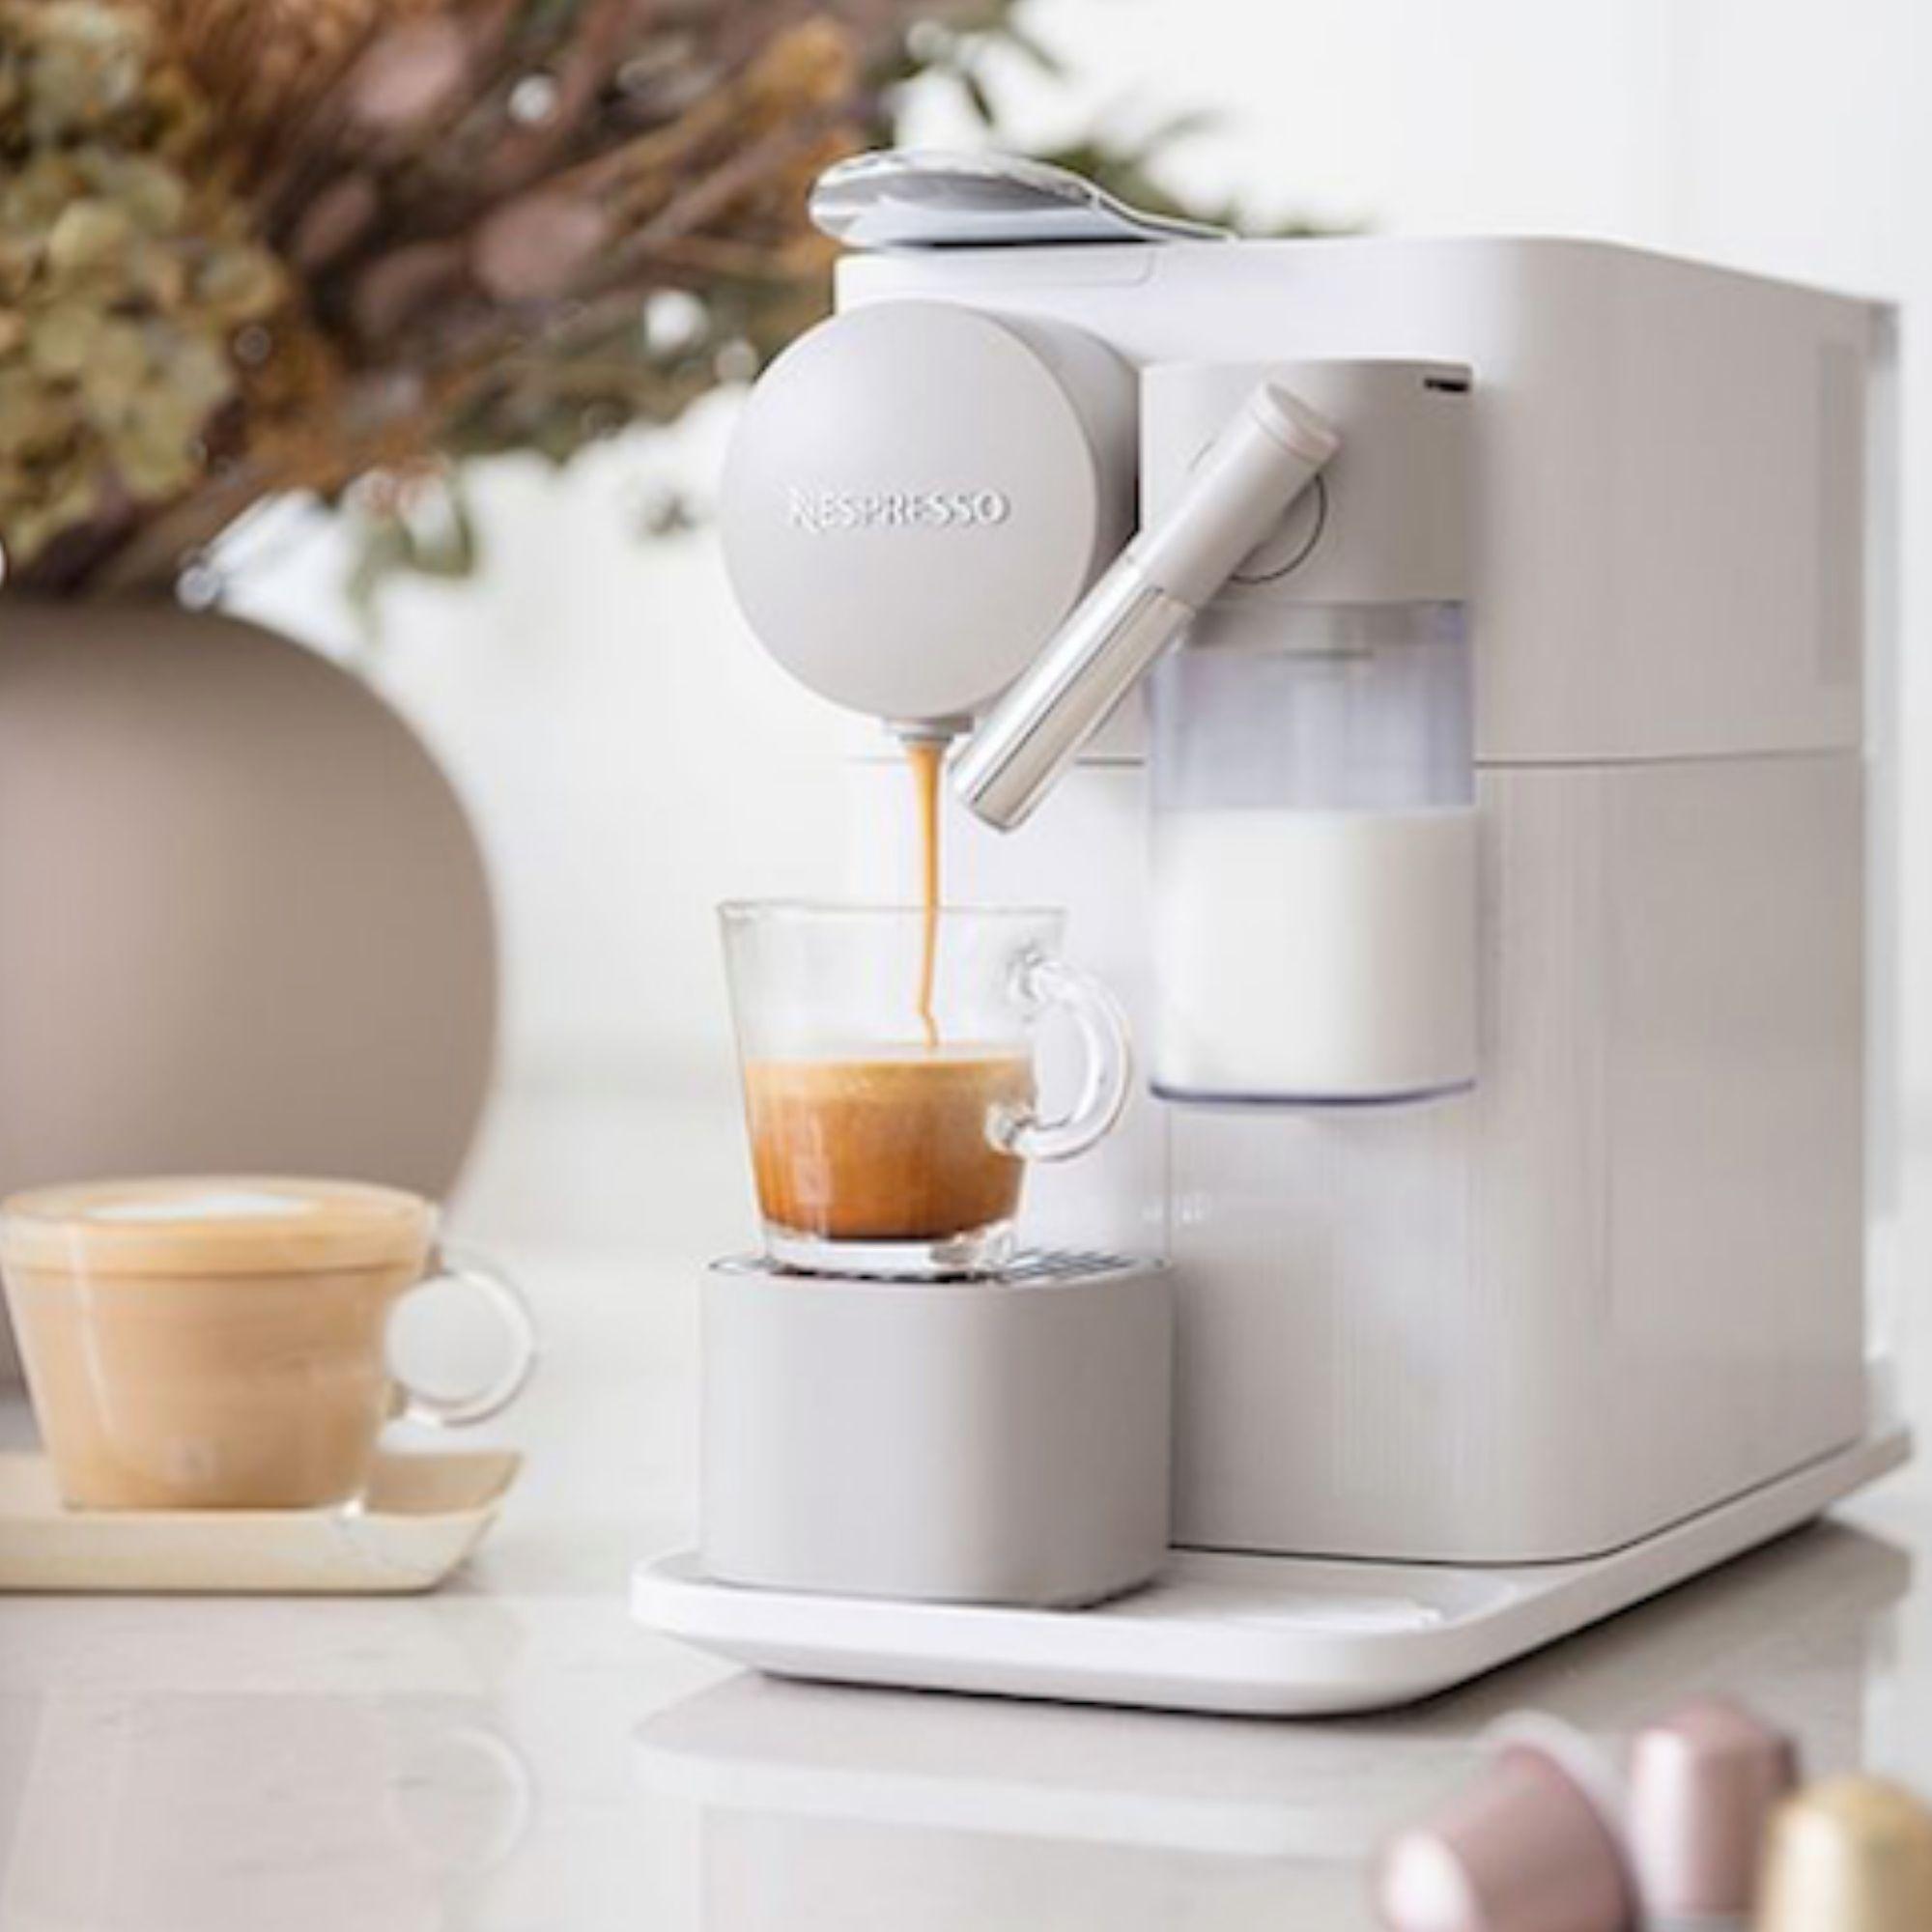 Nespresso machine making an espresso